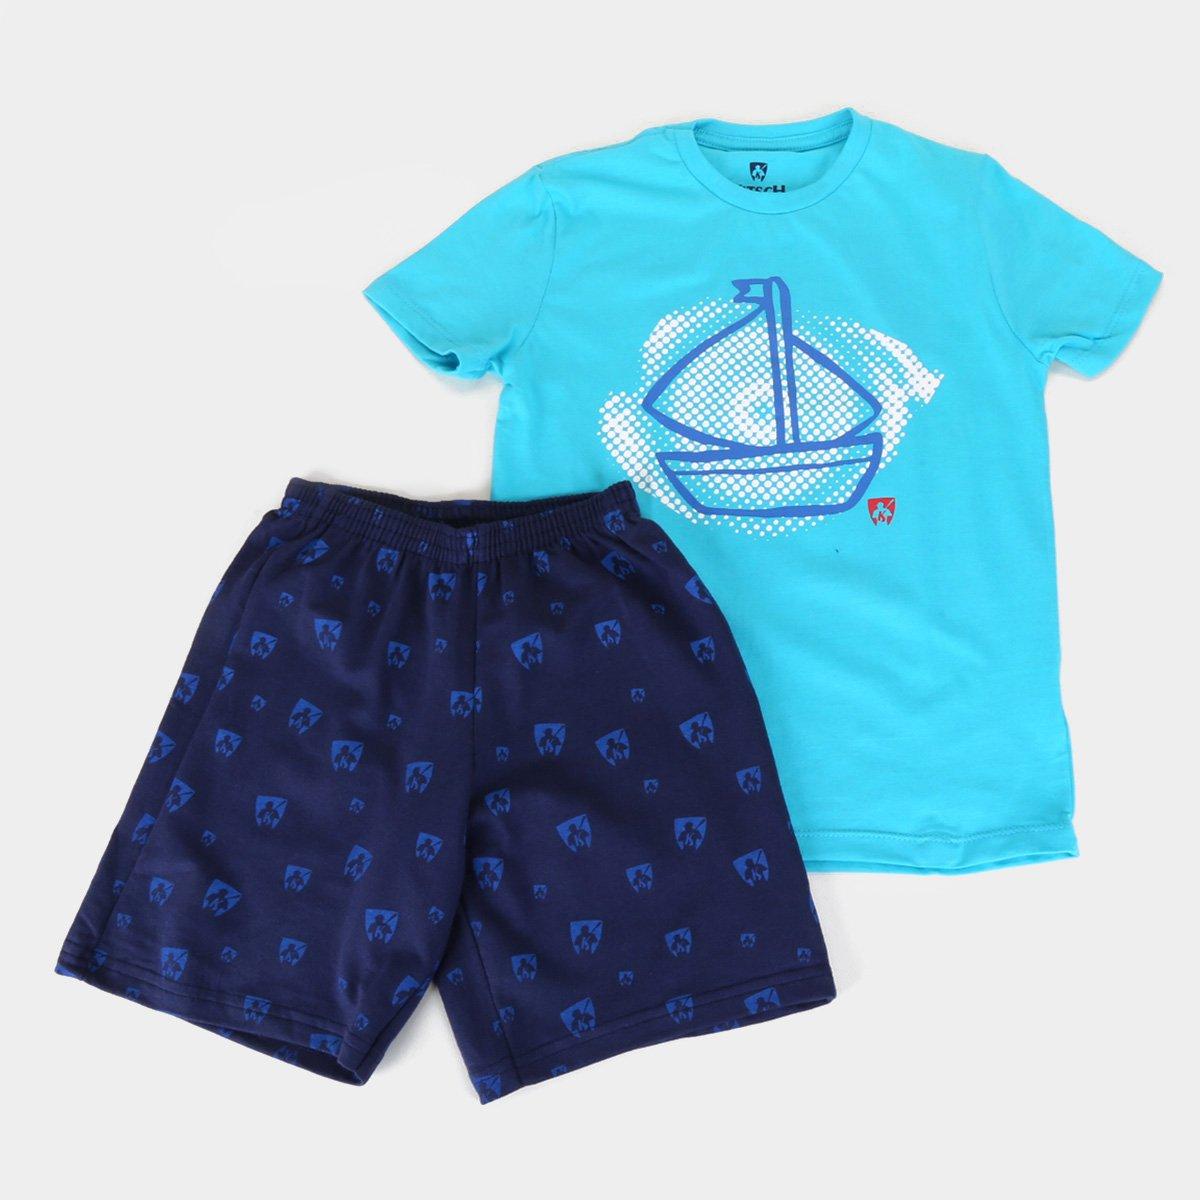 Conjunto Infantil MR. Kitsch Camiseta Barco + Short Full Print Masculino